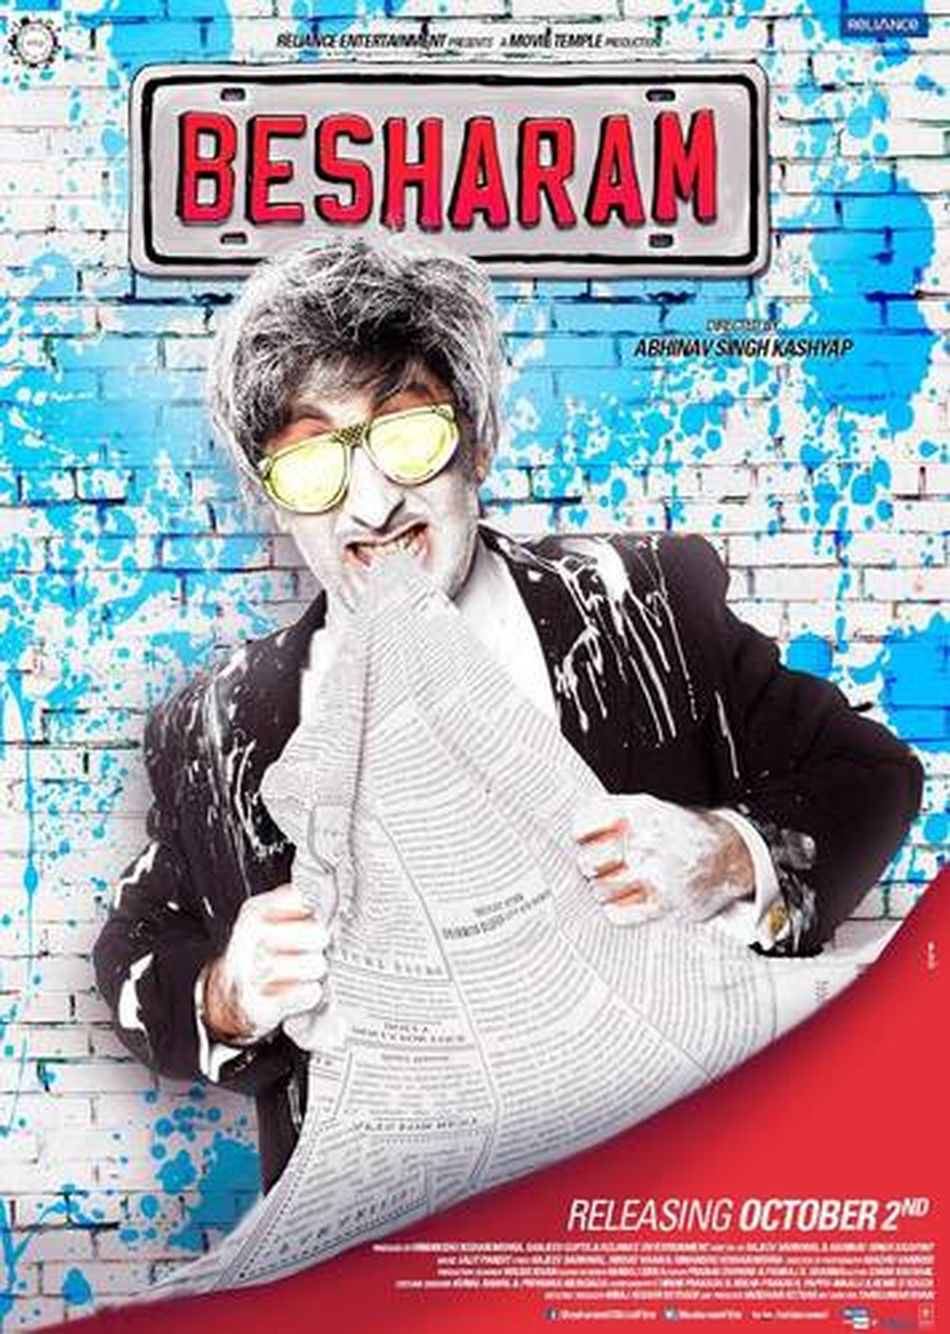 his latest film BESHARAM. Ranbir Kapoor